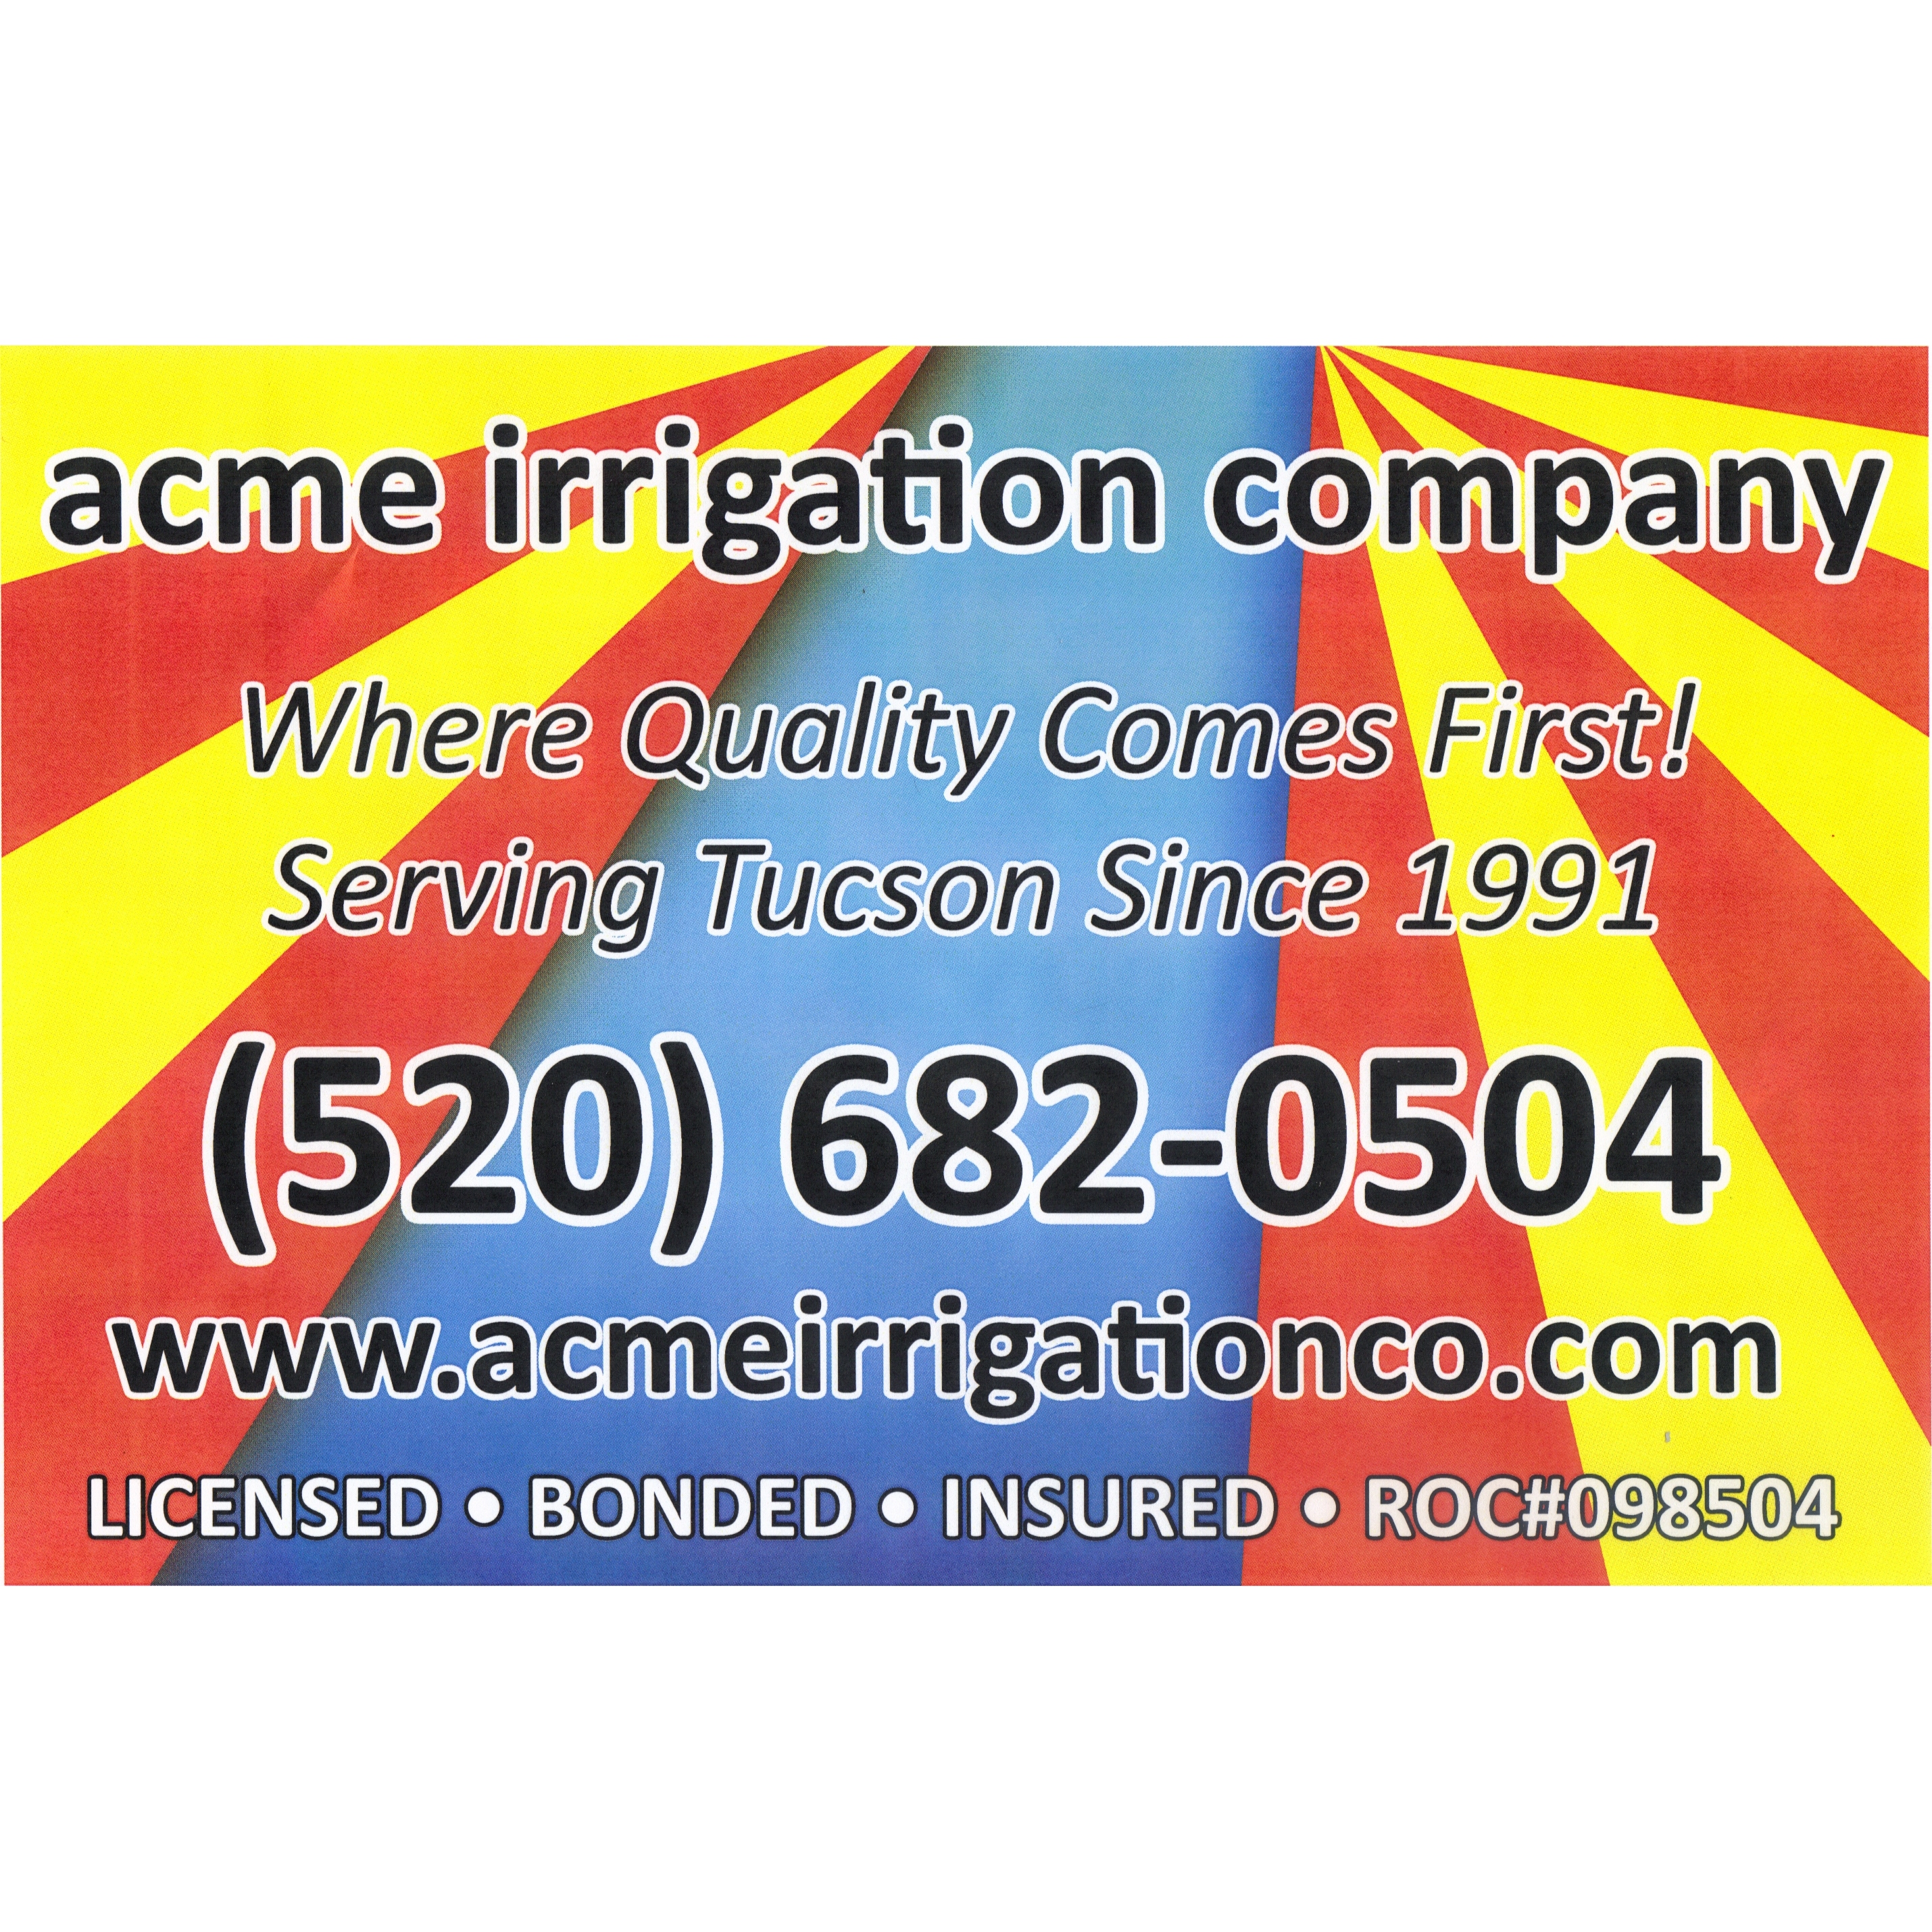 Acme Irrigation Company